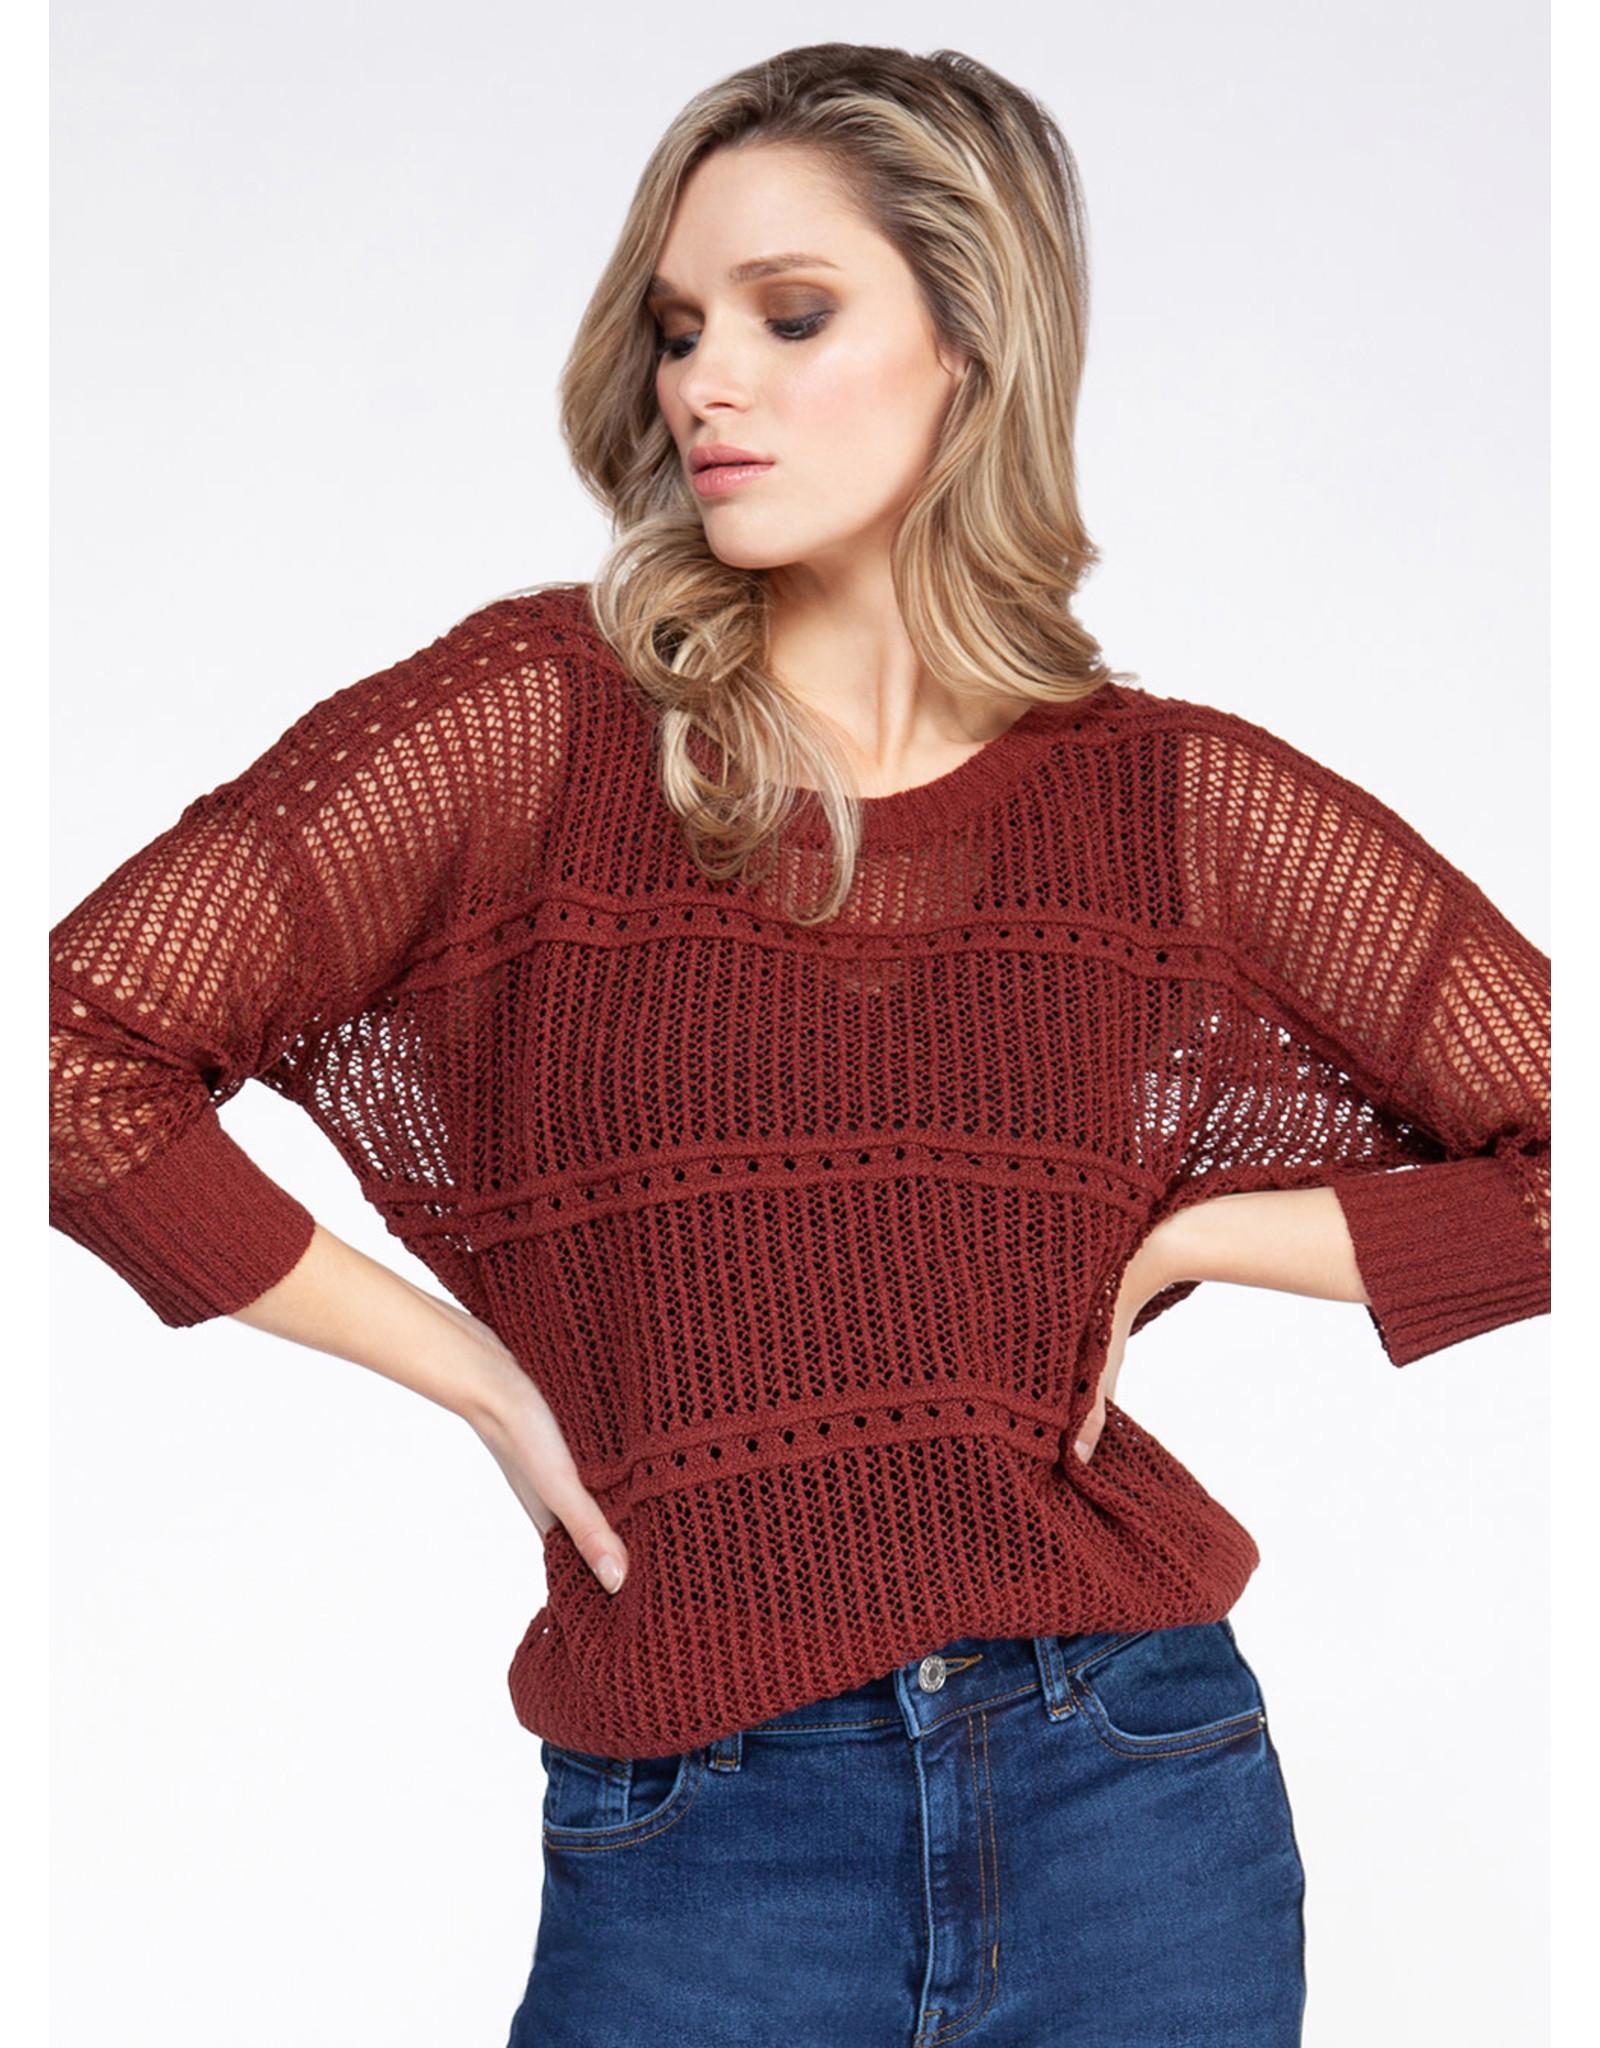 3/4 Sleeve Boat Neck Sweater